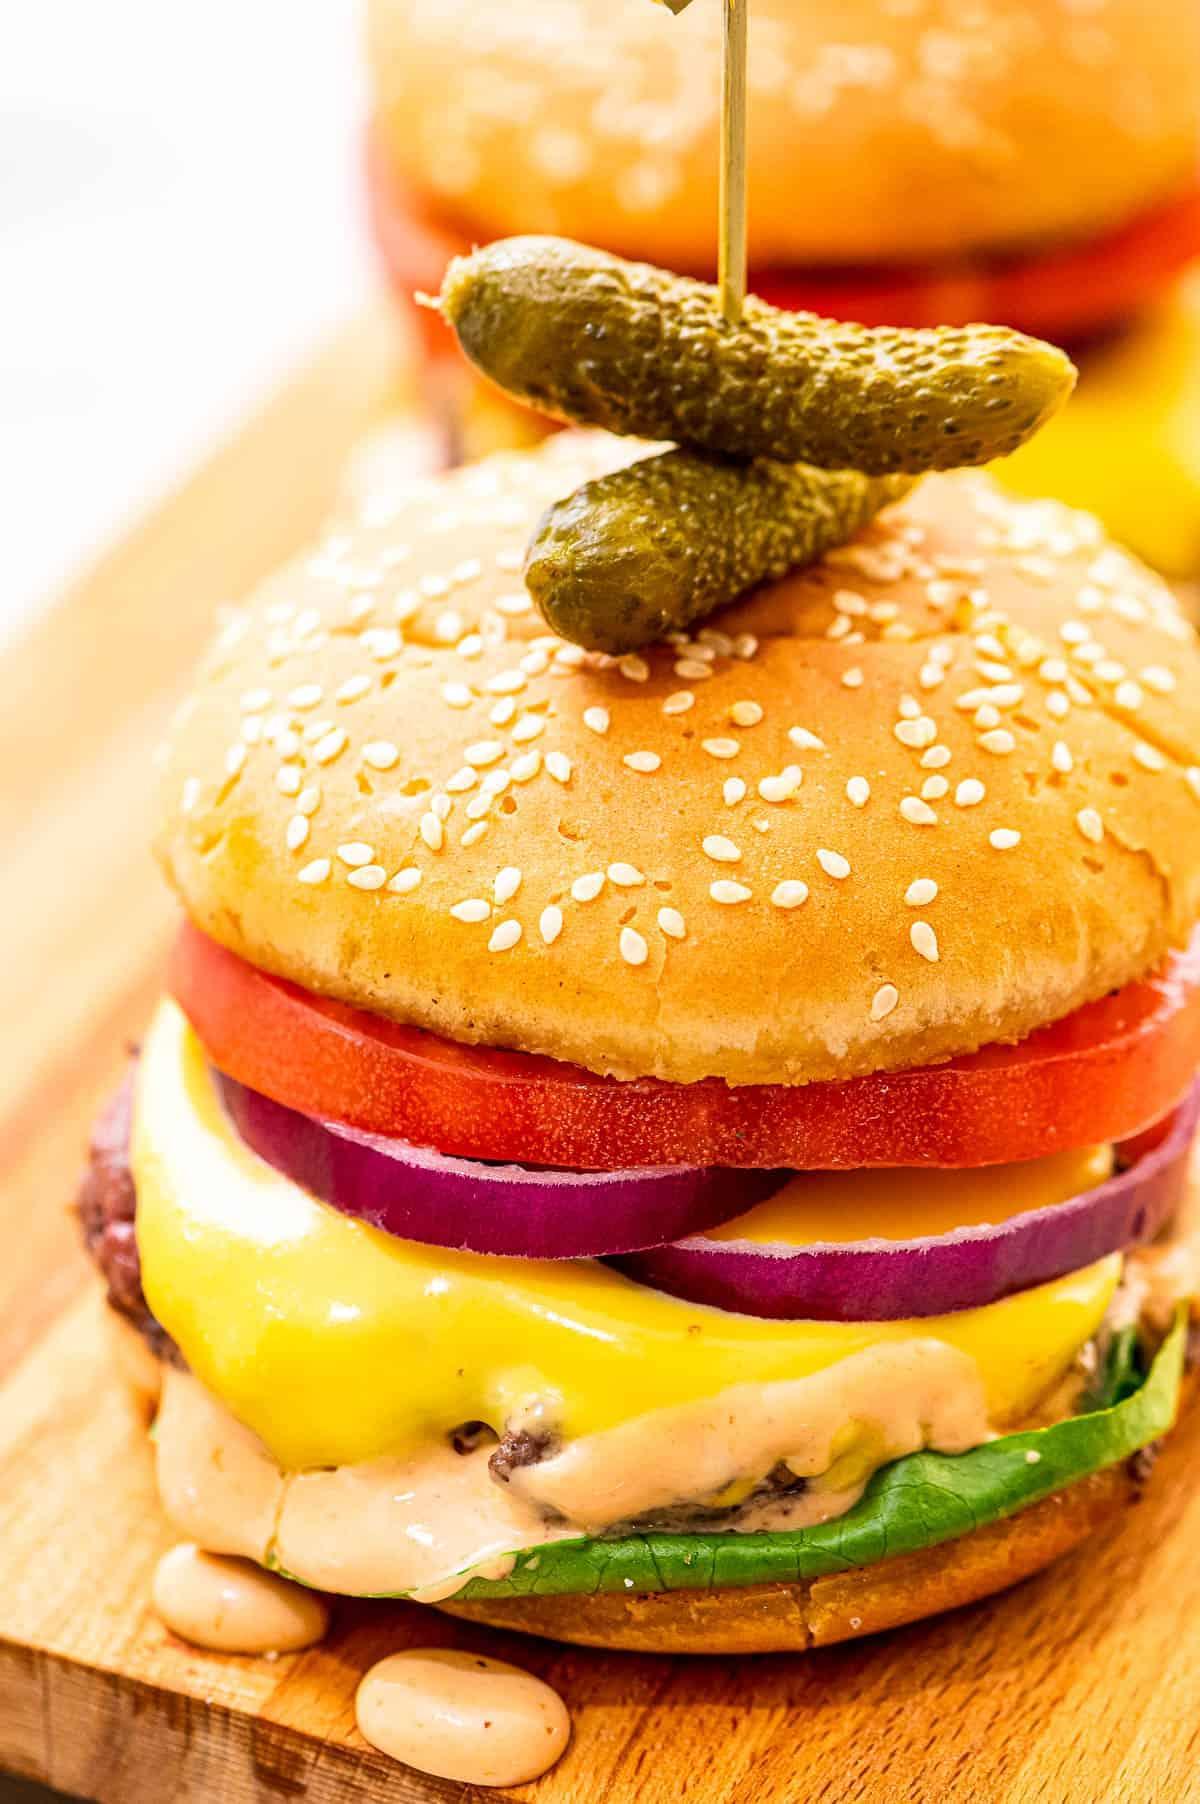 Cheeseburger with condiments on bun